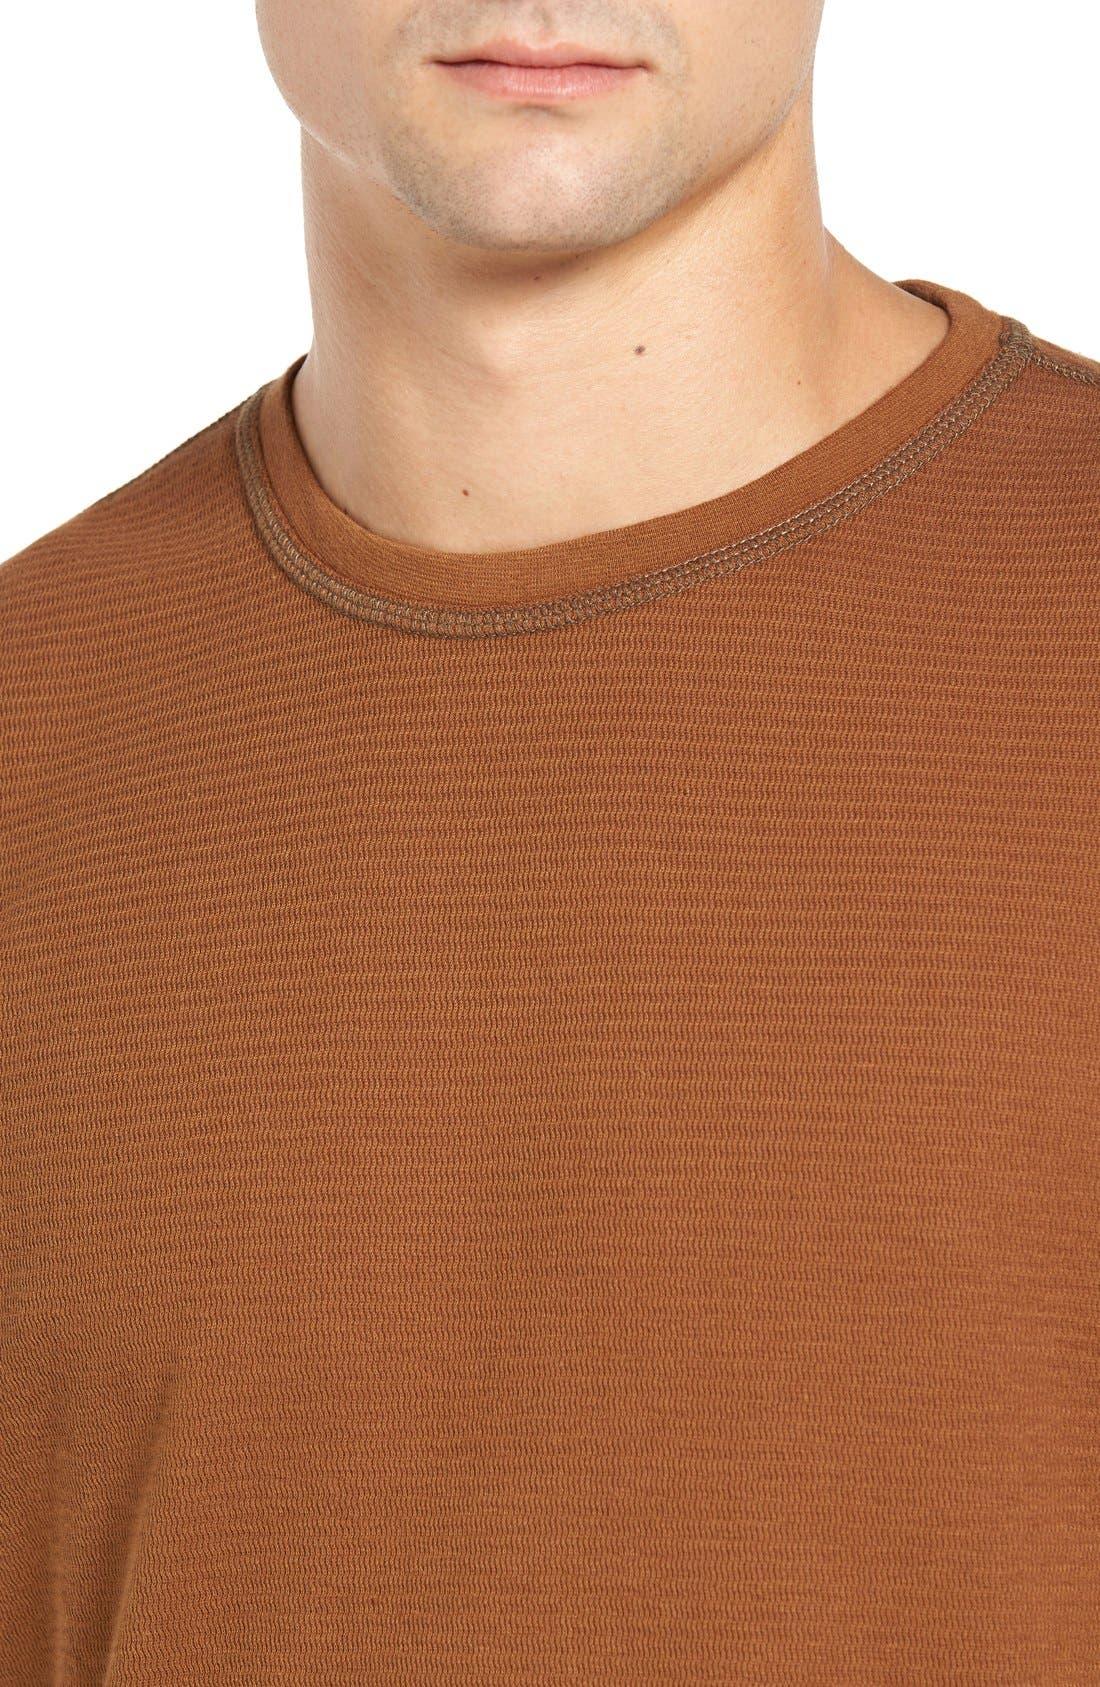 Larsen Zigzag Thermal T-Shirt,                             Alternate thumbnail 14, color,